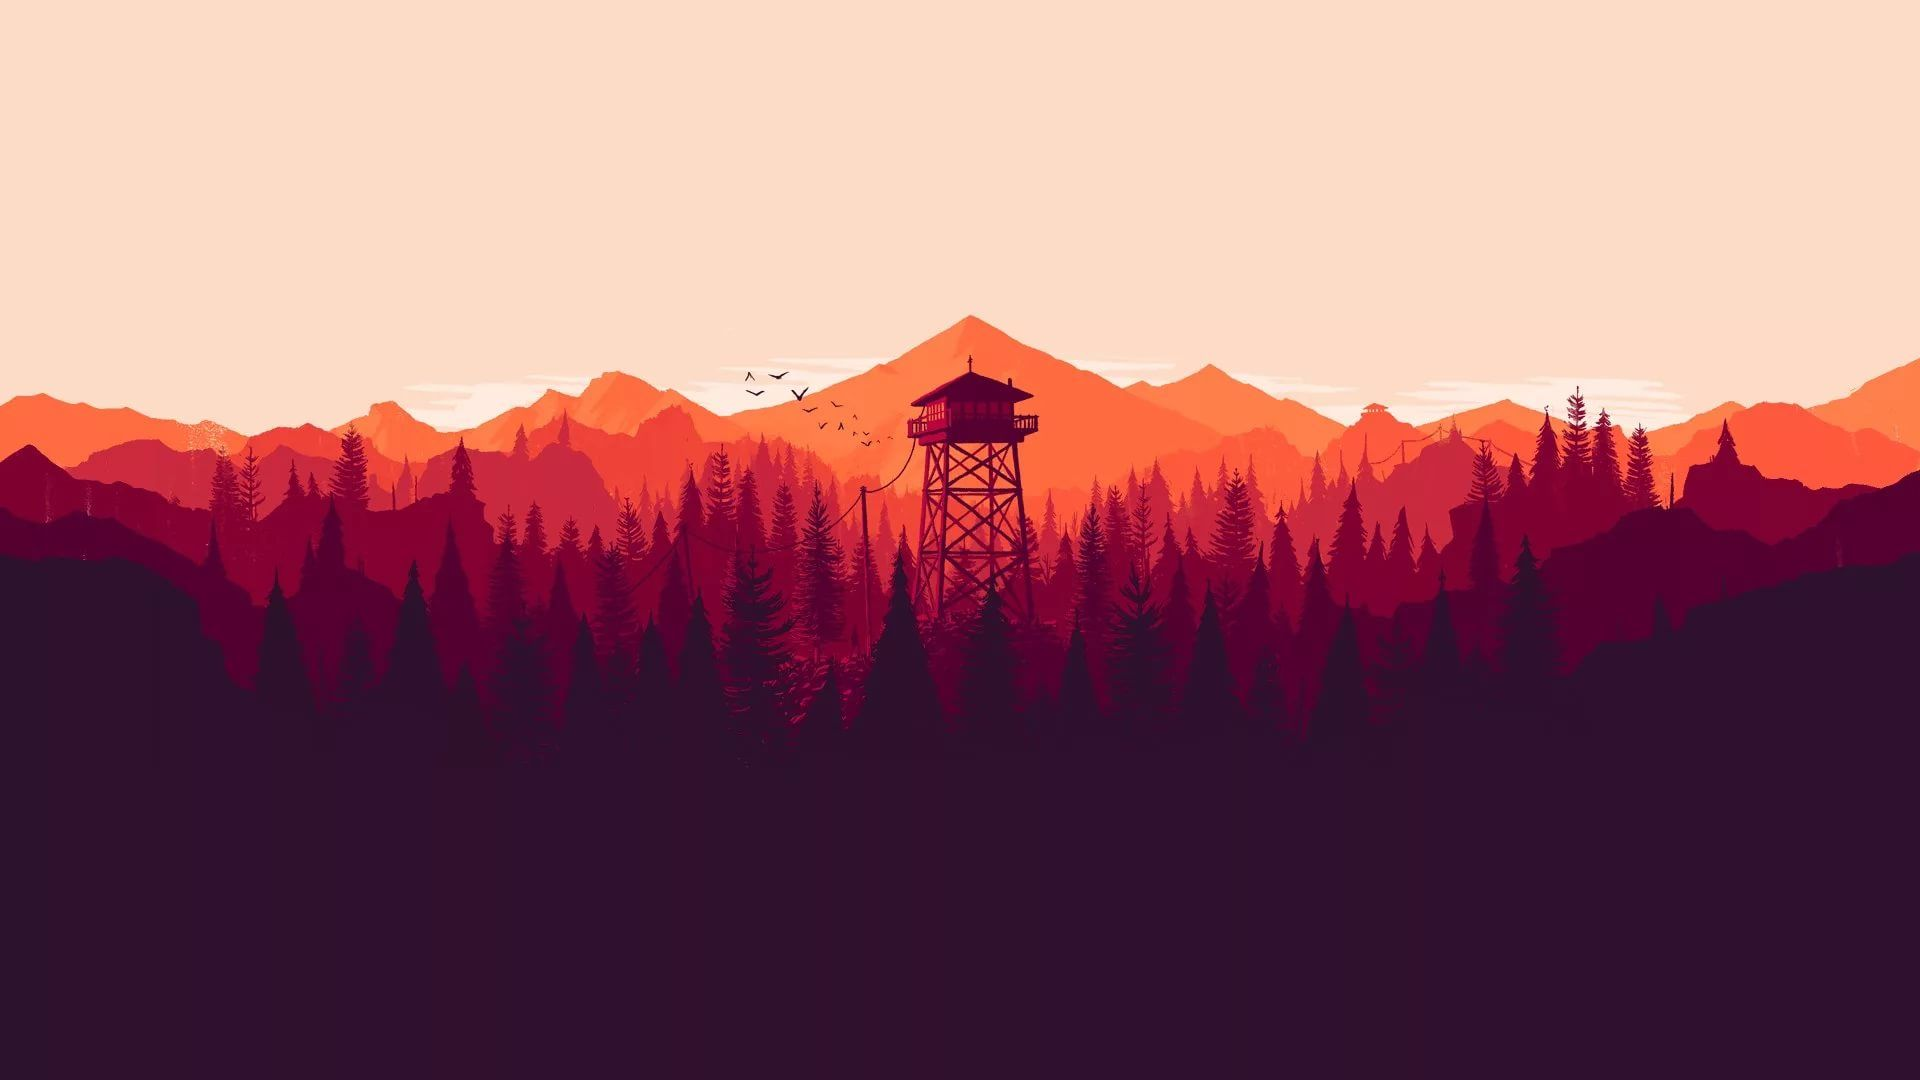 Minimalist Desktop background wallpaper